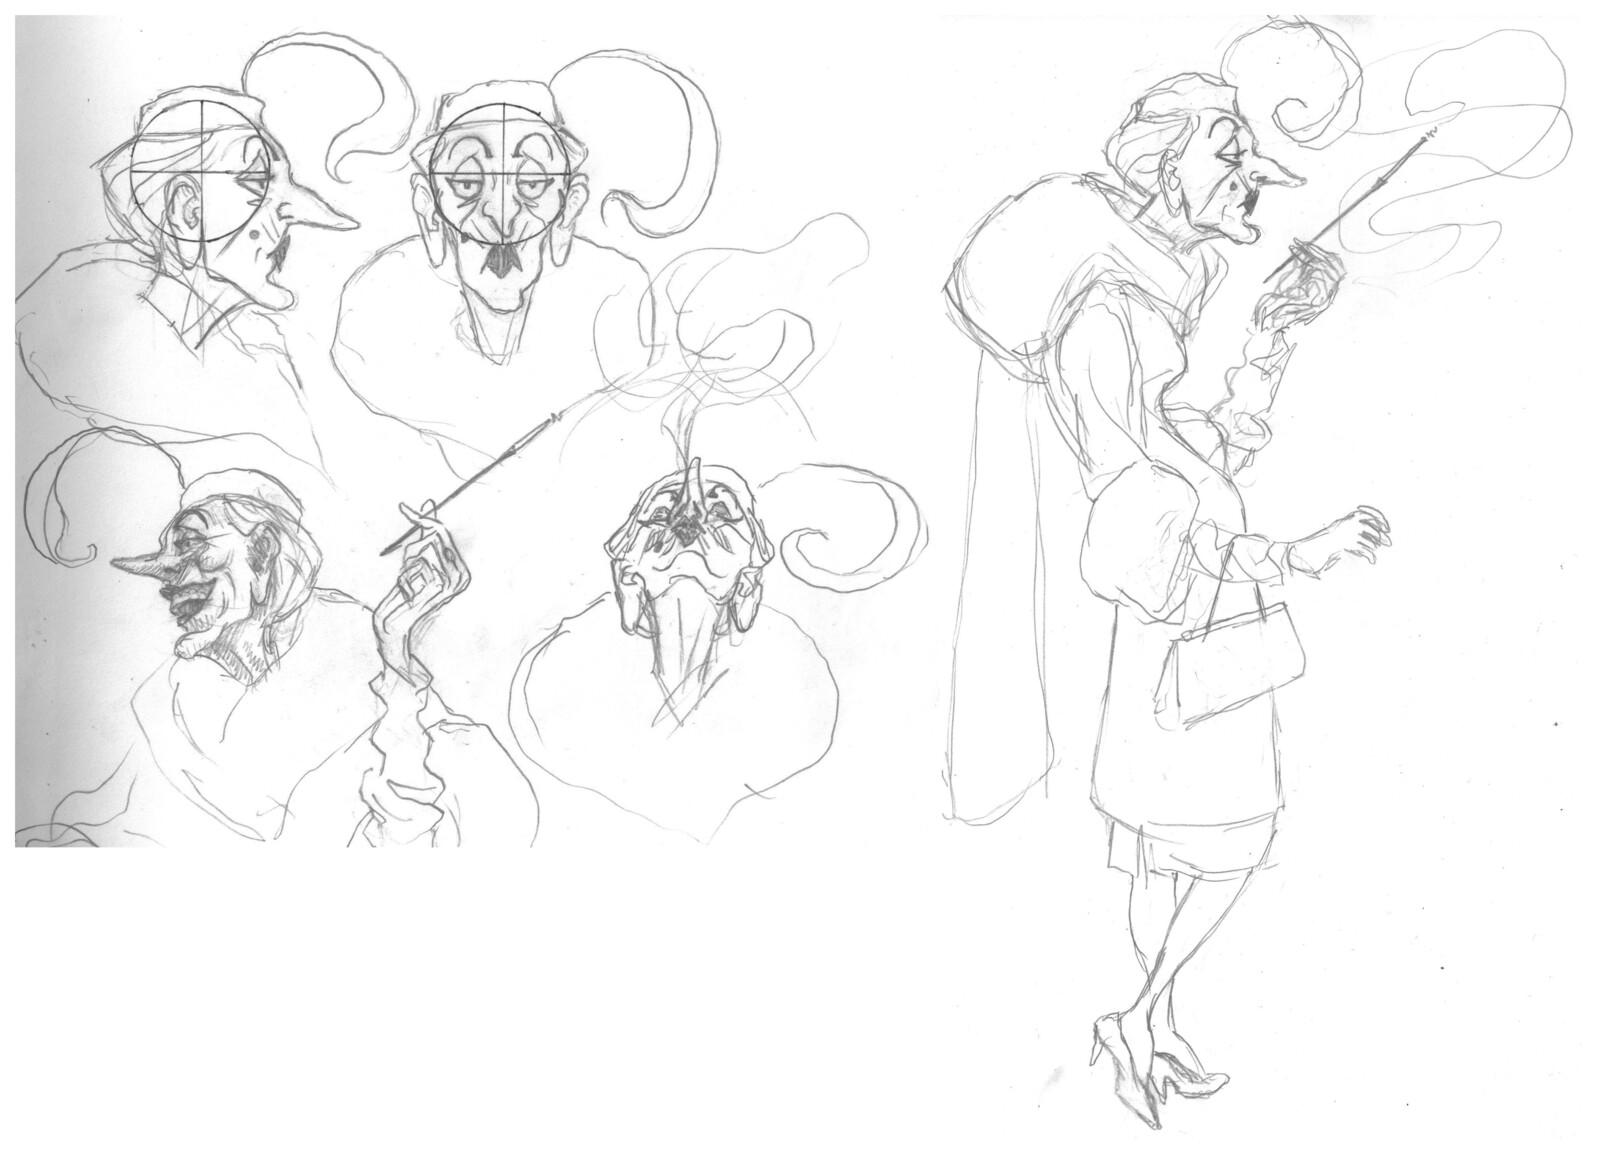 My initial Veronique concepts.